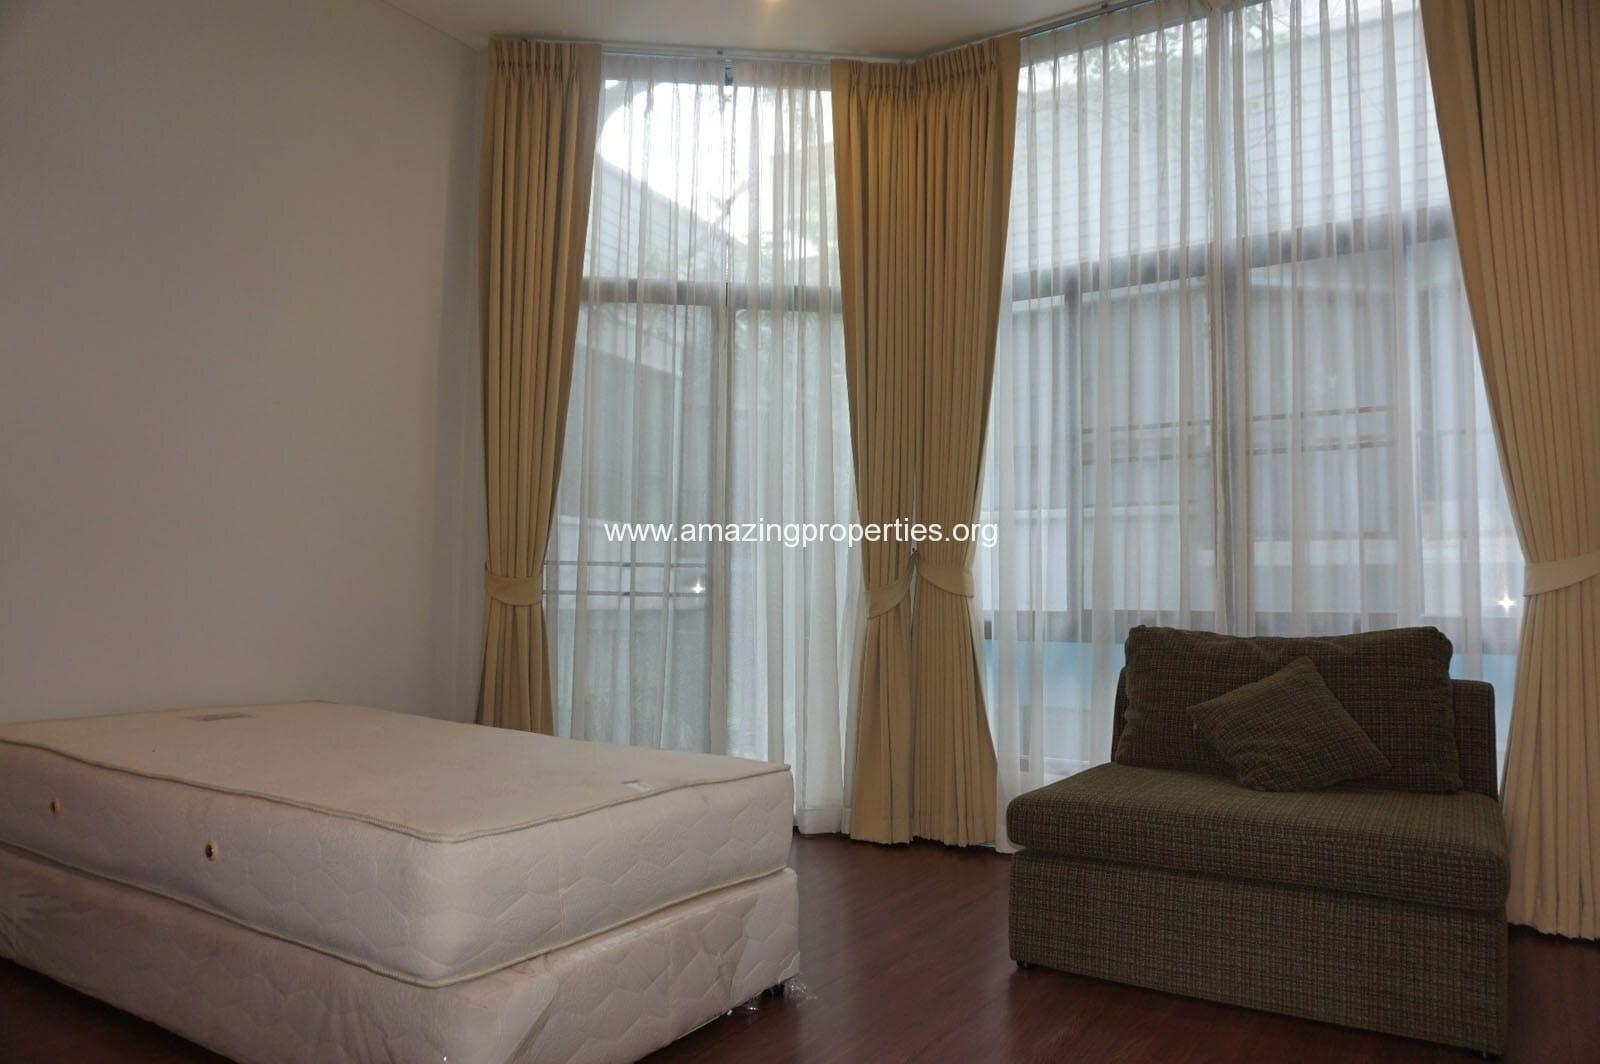 4 bedroom Veranda Ville-2